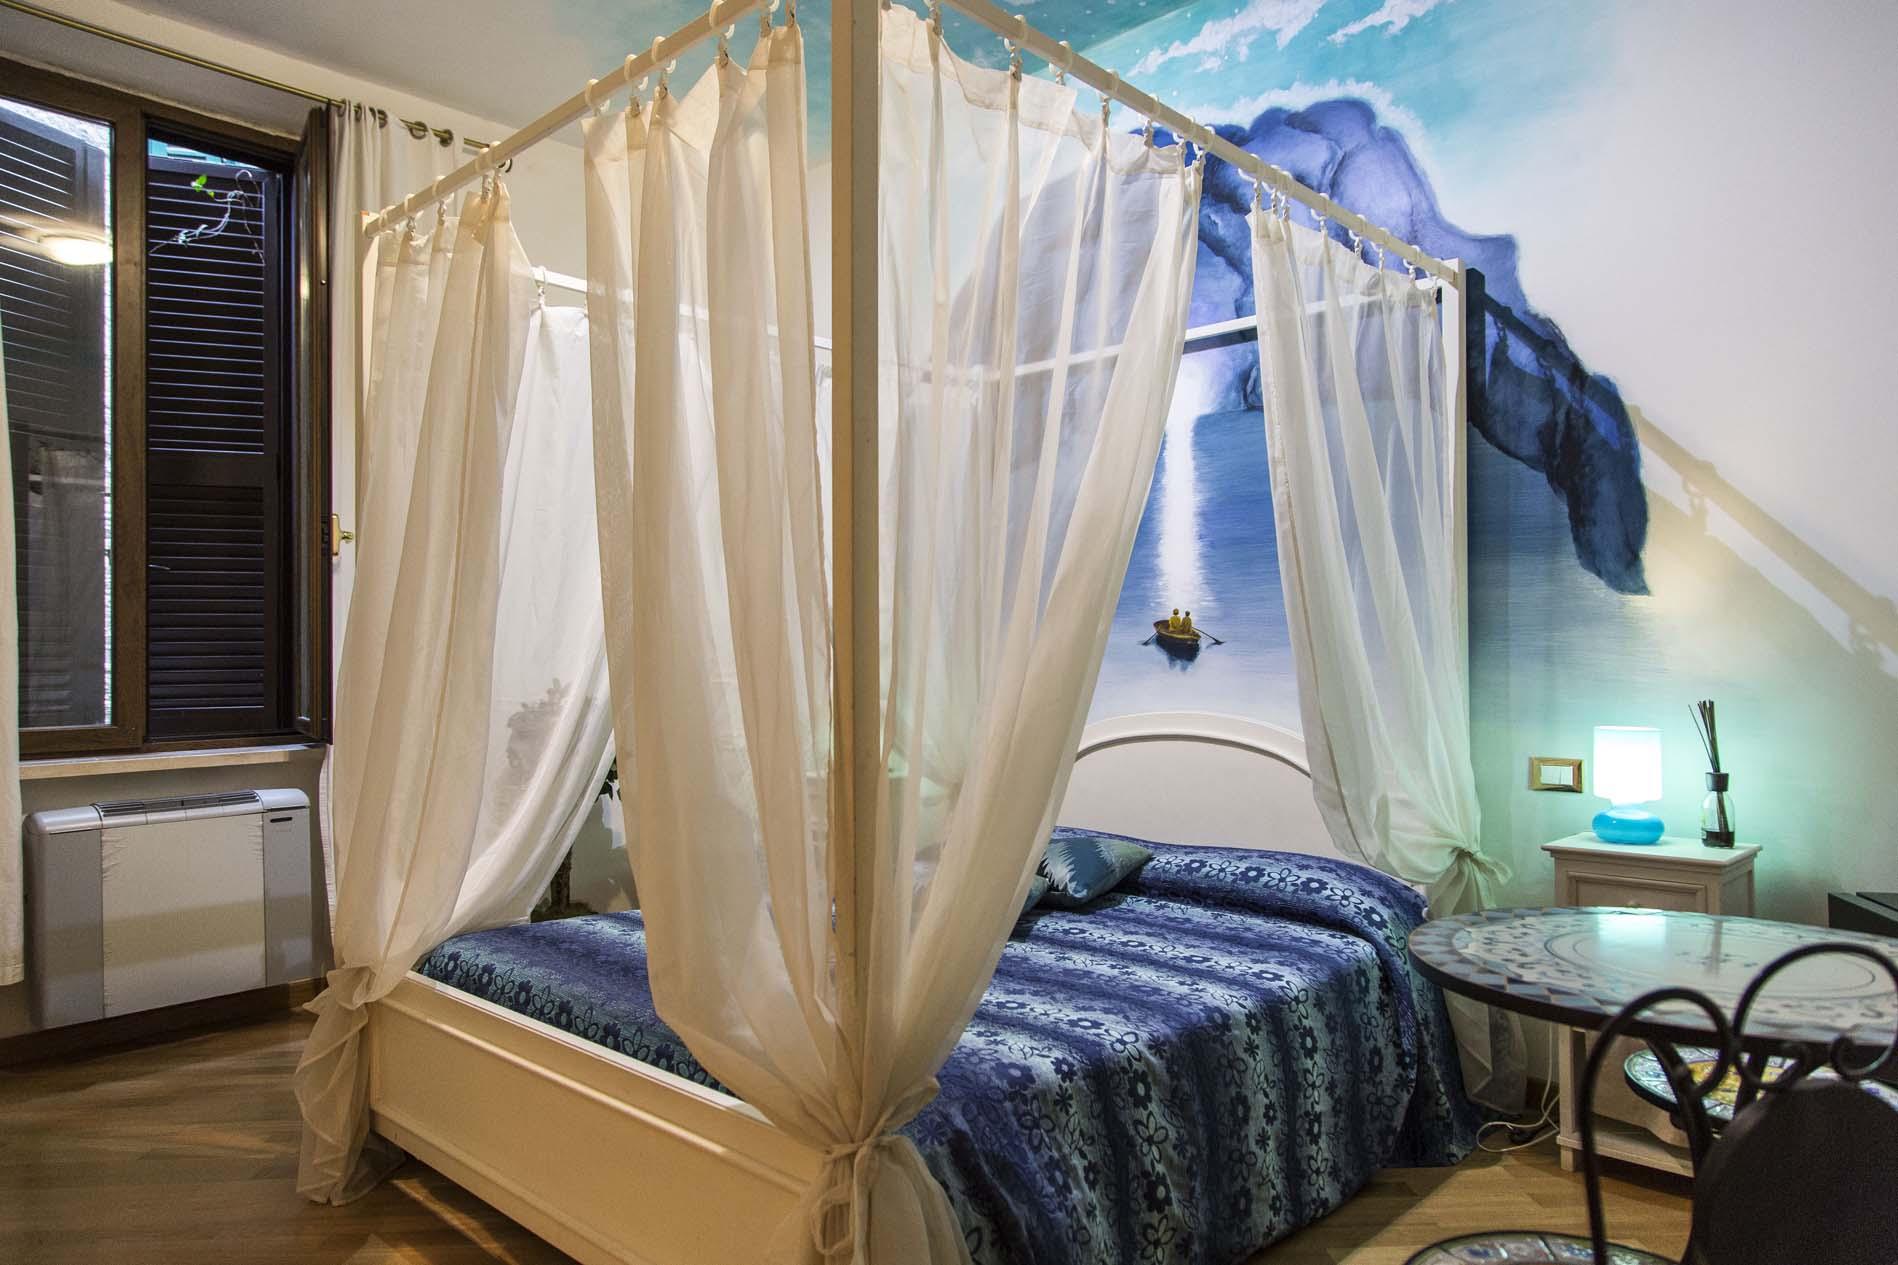 capri- Bed & Breakfast a Tivoli